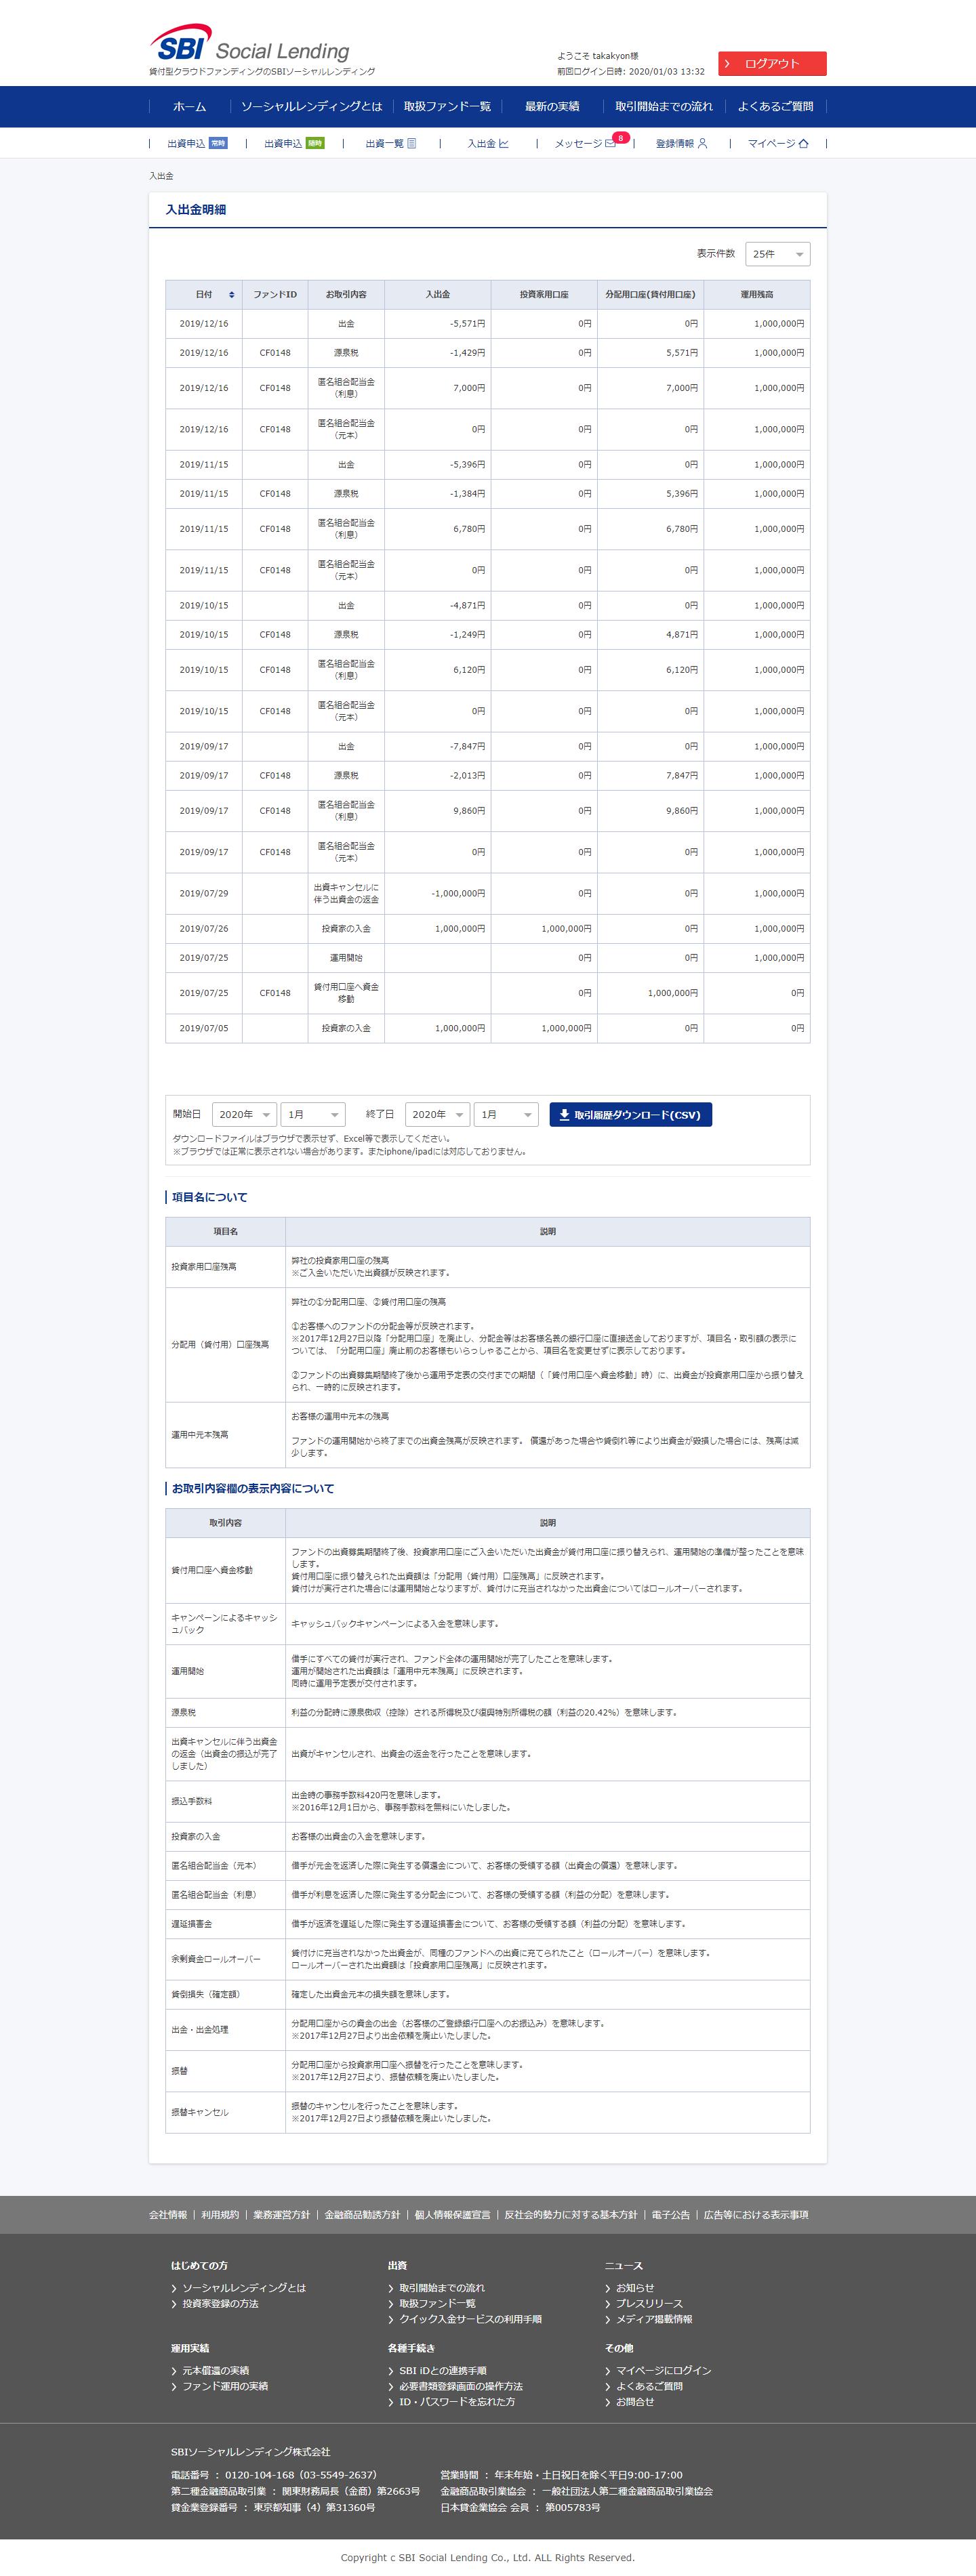 screencapture-sbi-sociallending-jp-accounthistory-display-transactions-2020-01-03-21_44_52.png